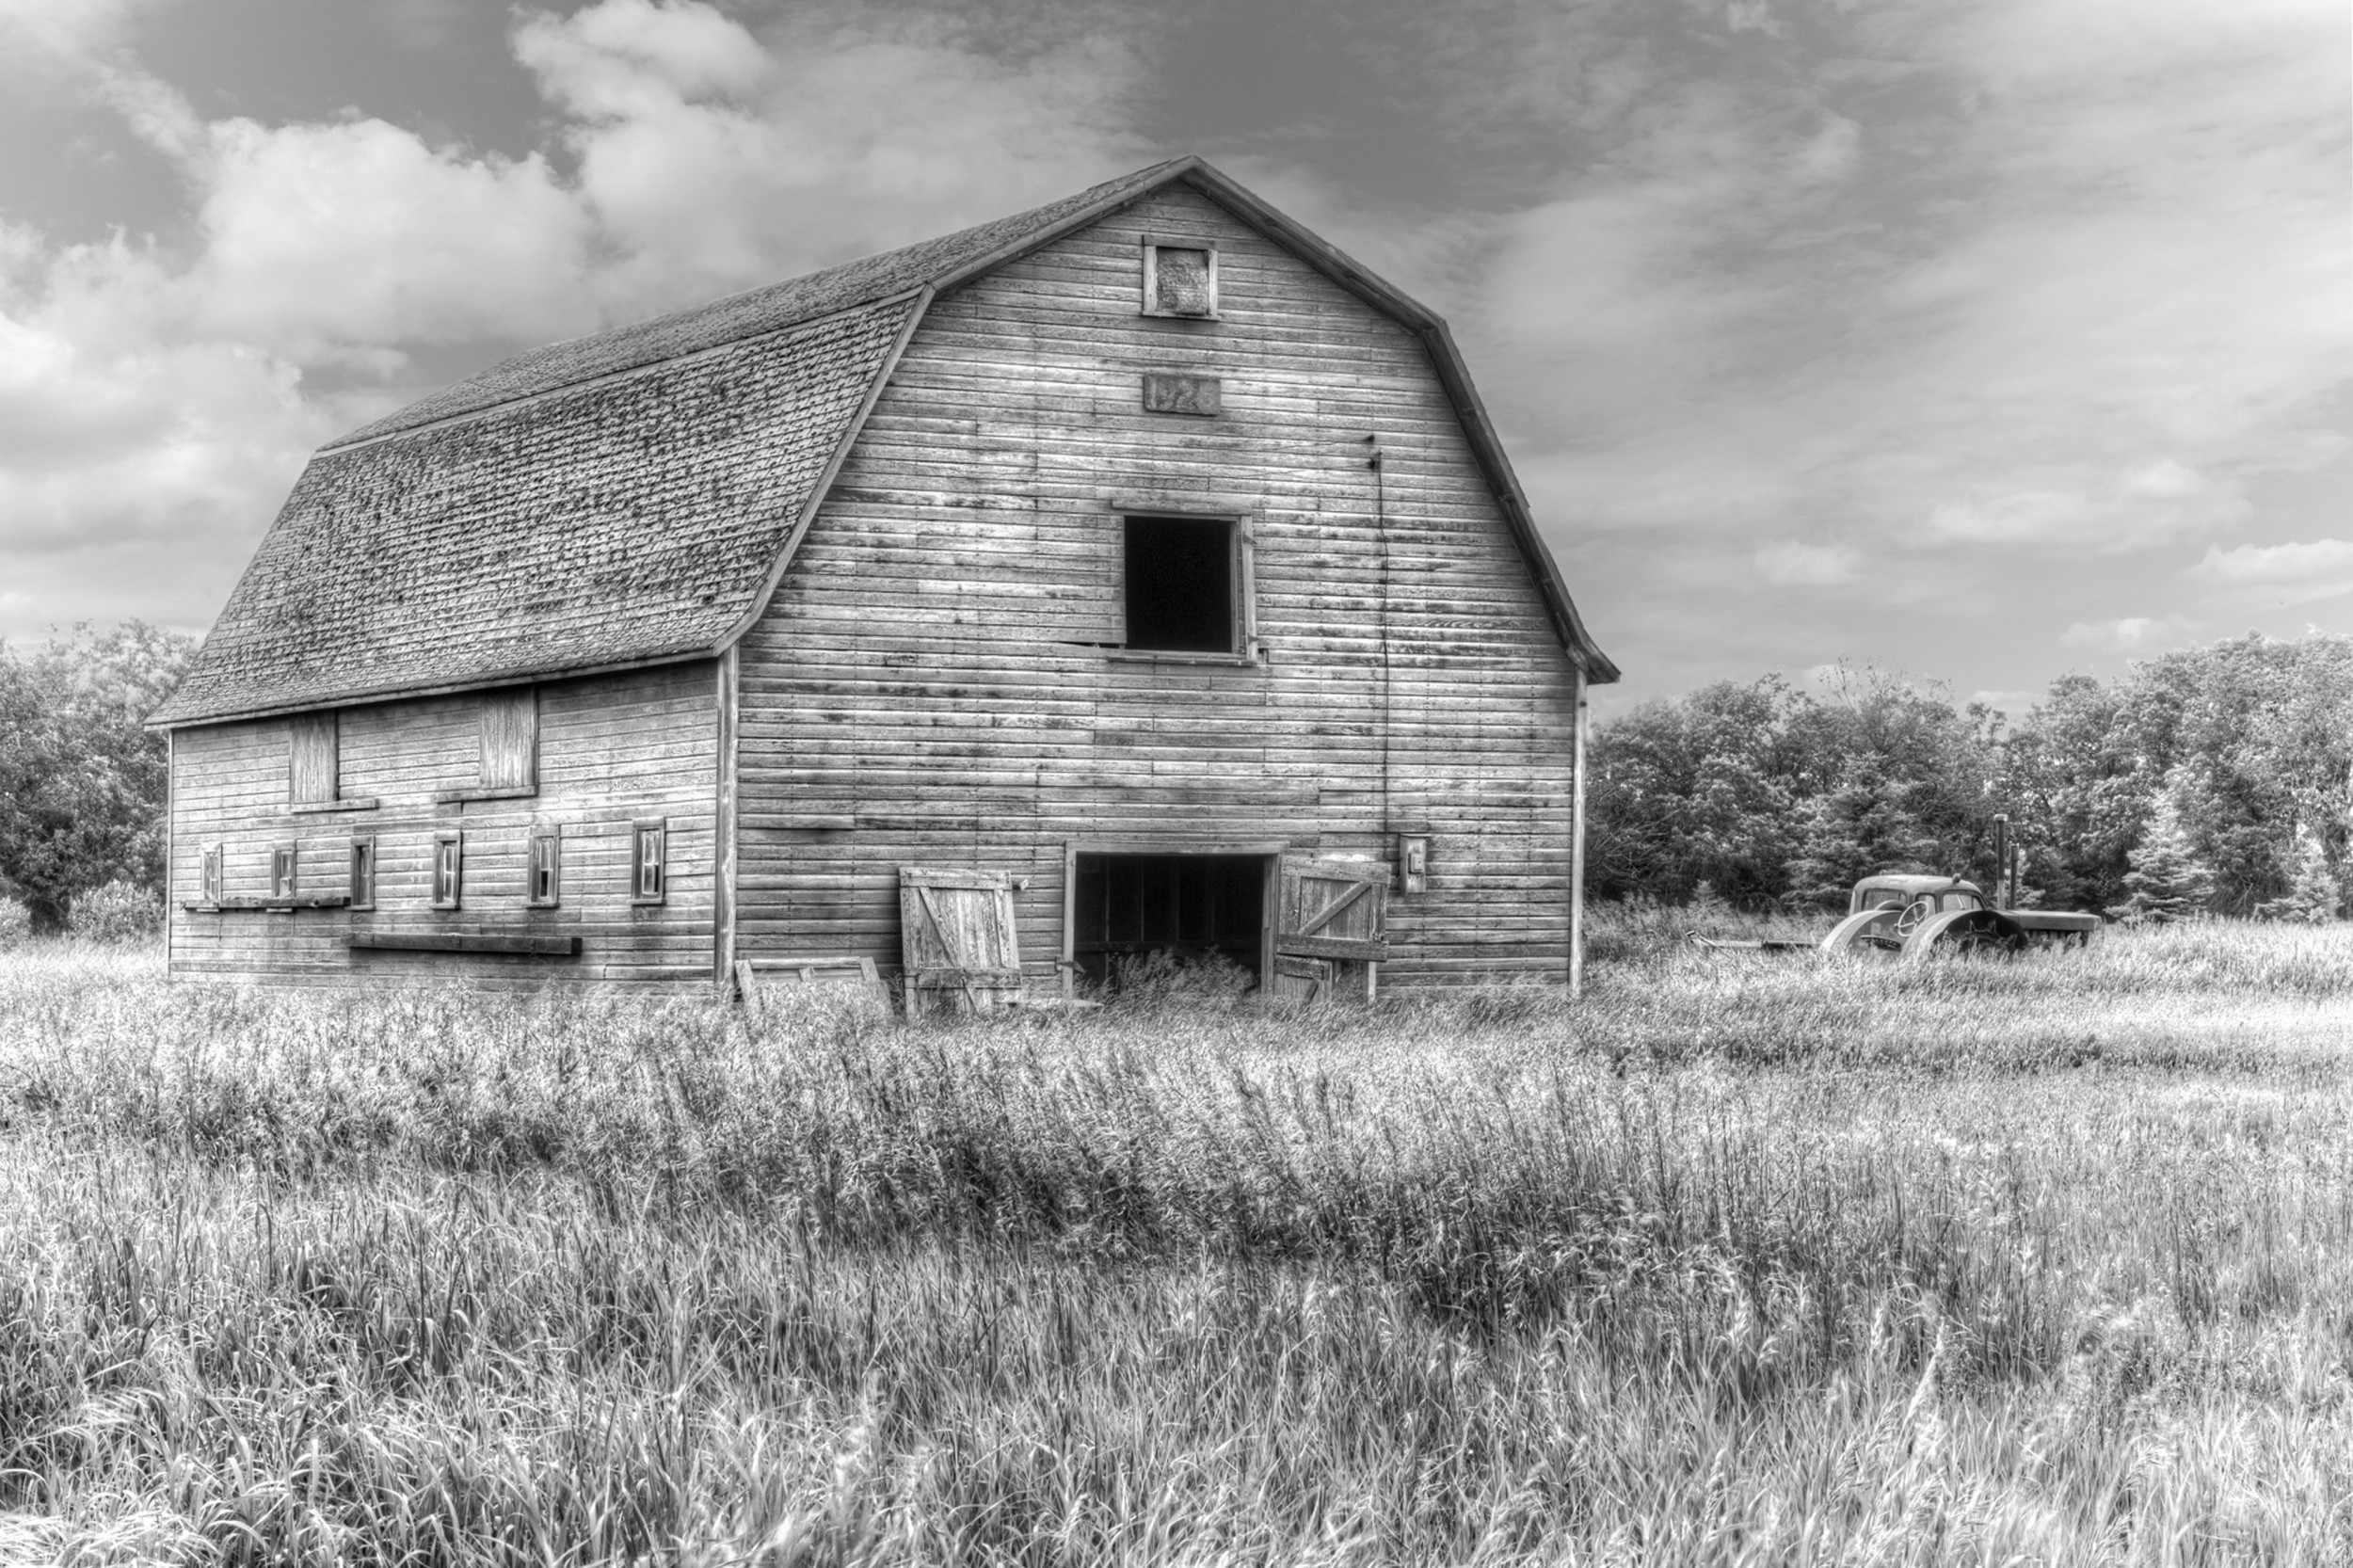 farm treasure hunt missing yorker